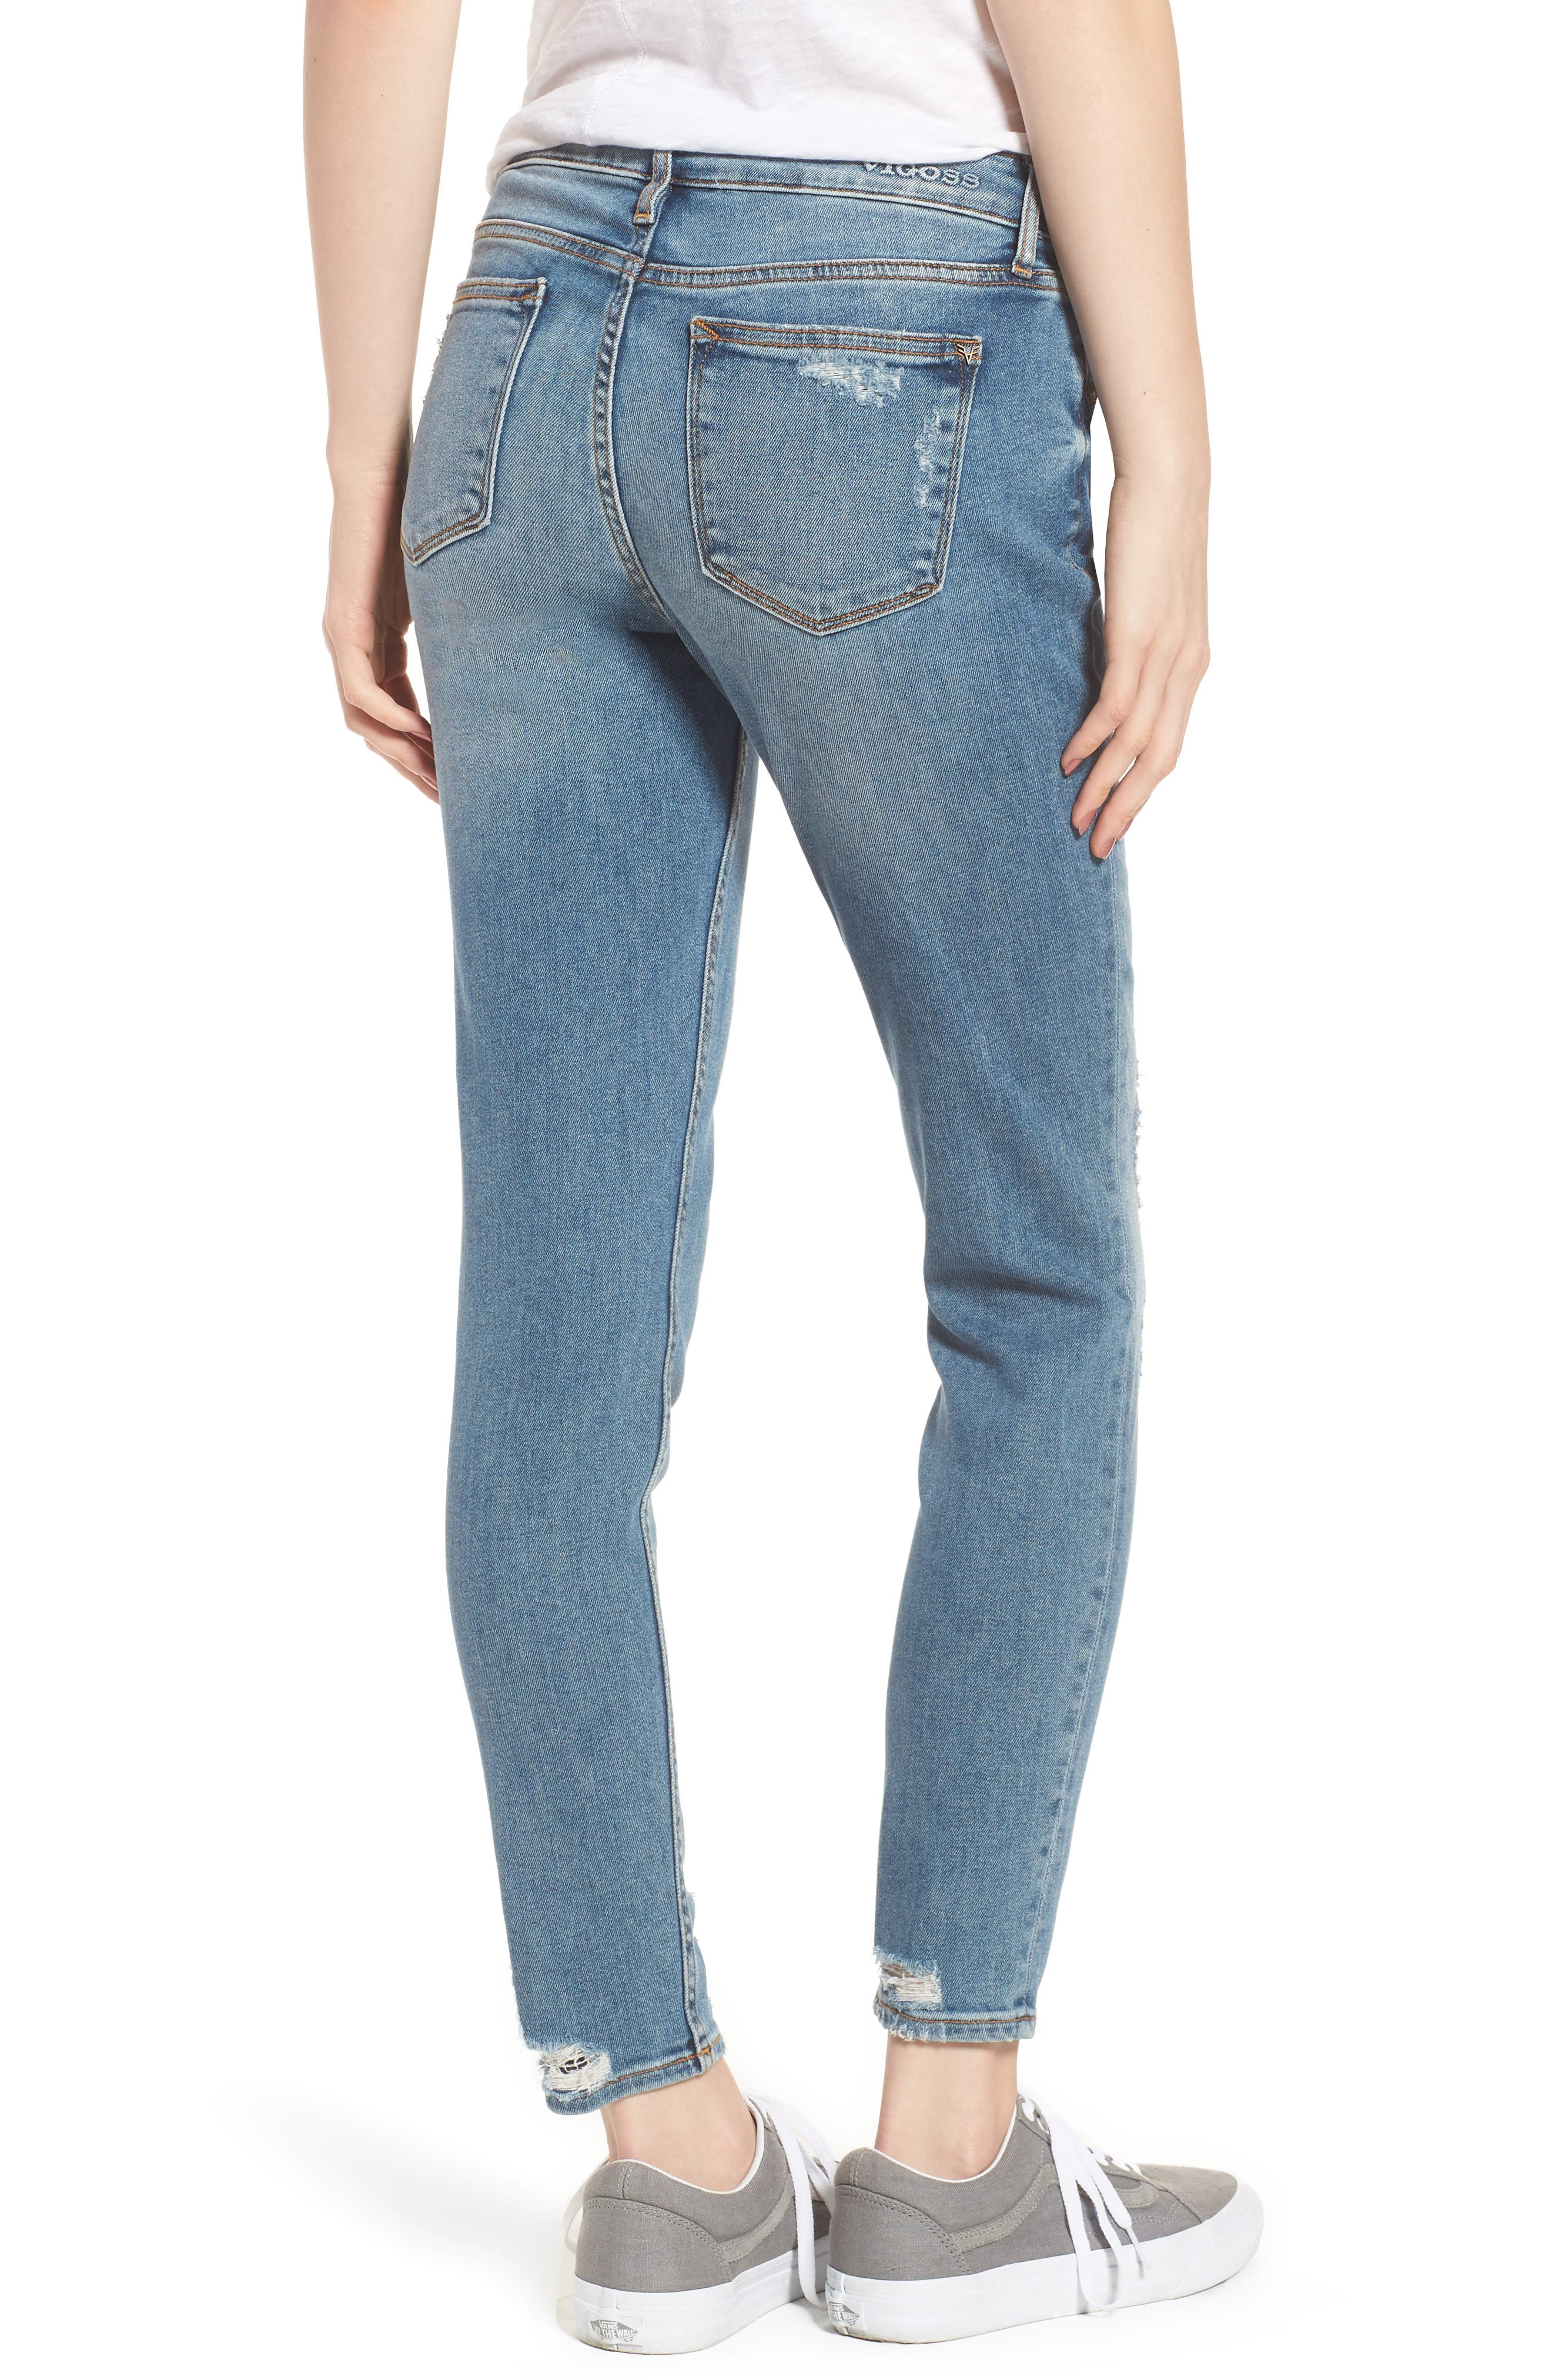 Jagger Decon Distressed Skinny Jeans,                             Alternate thumbnail 2, color,                             Medium Wash